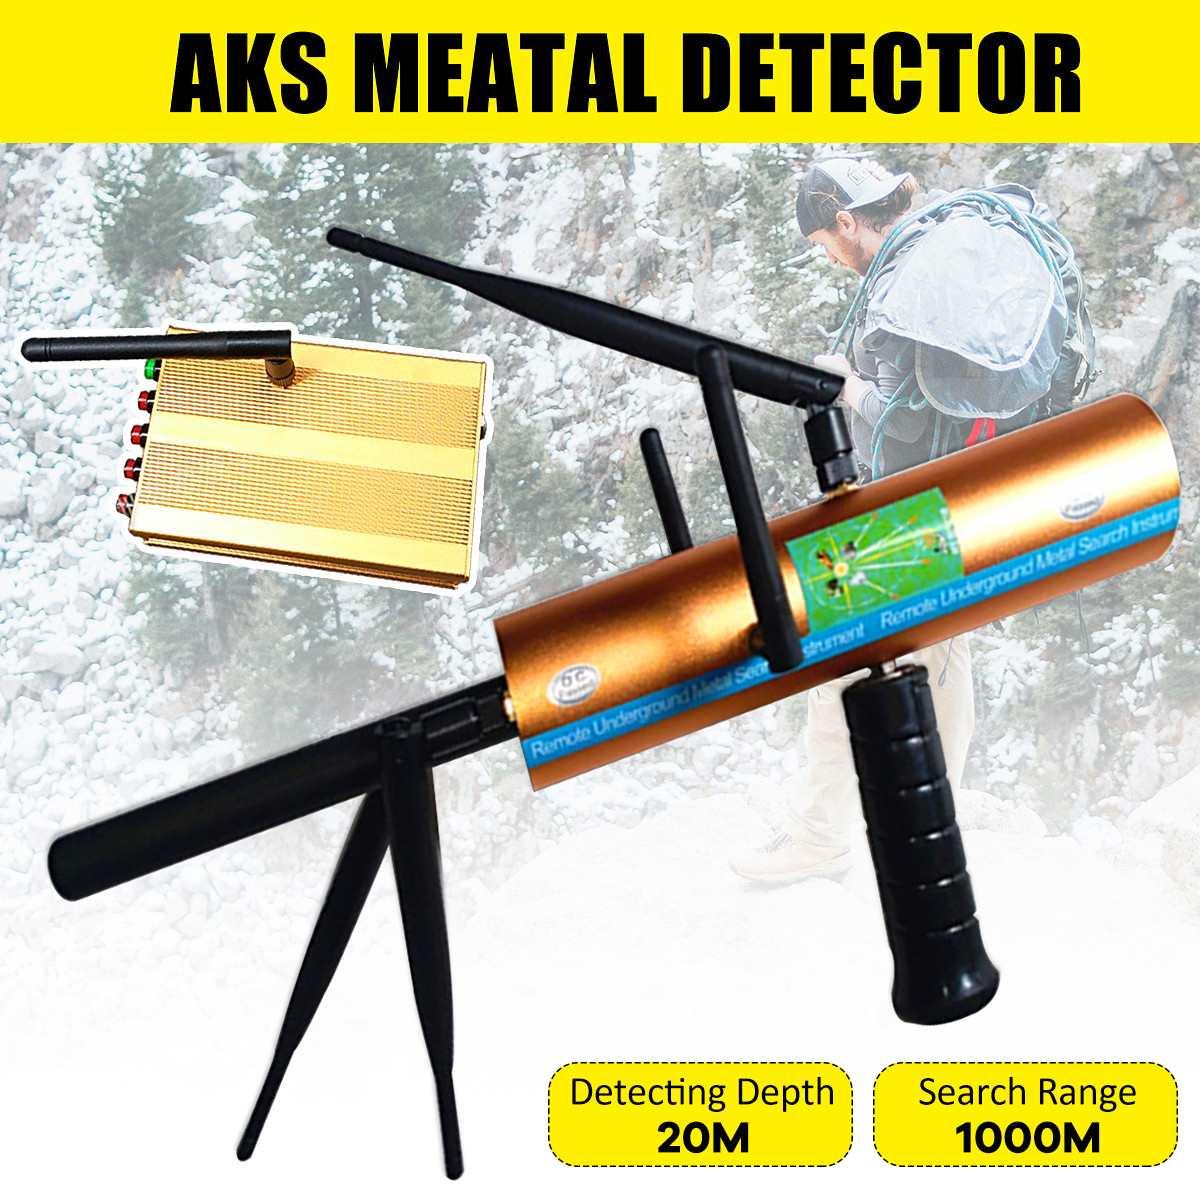 Intelligent Updatd Aks Handhold Antenna Professional Metal/gold 3d Metal Detector 1000m Range Machinery Gold Finder 2019 New Arrival